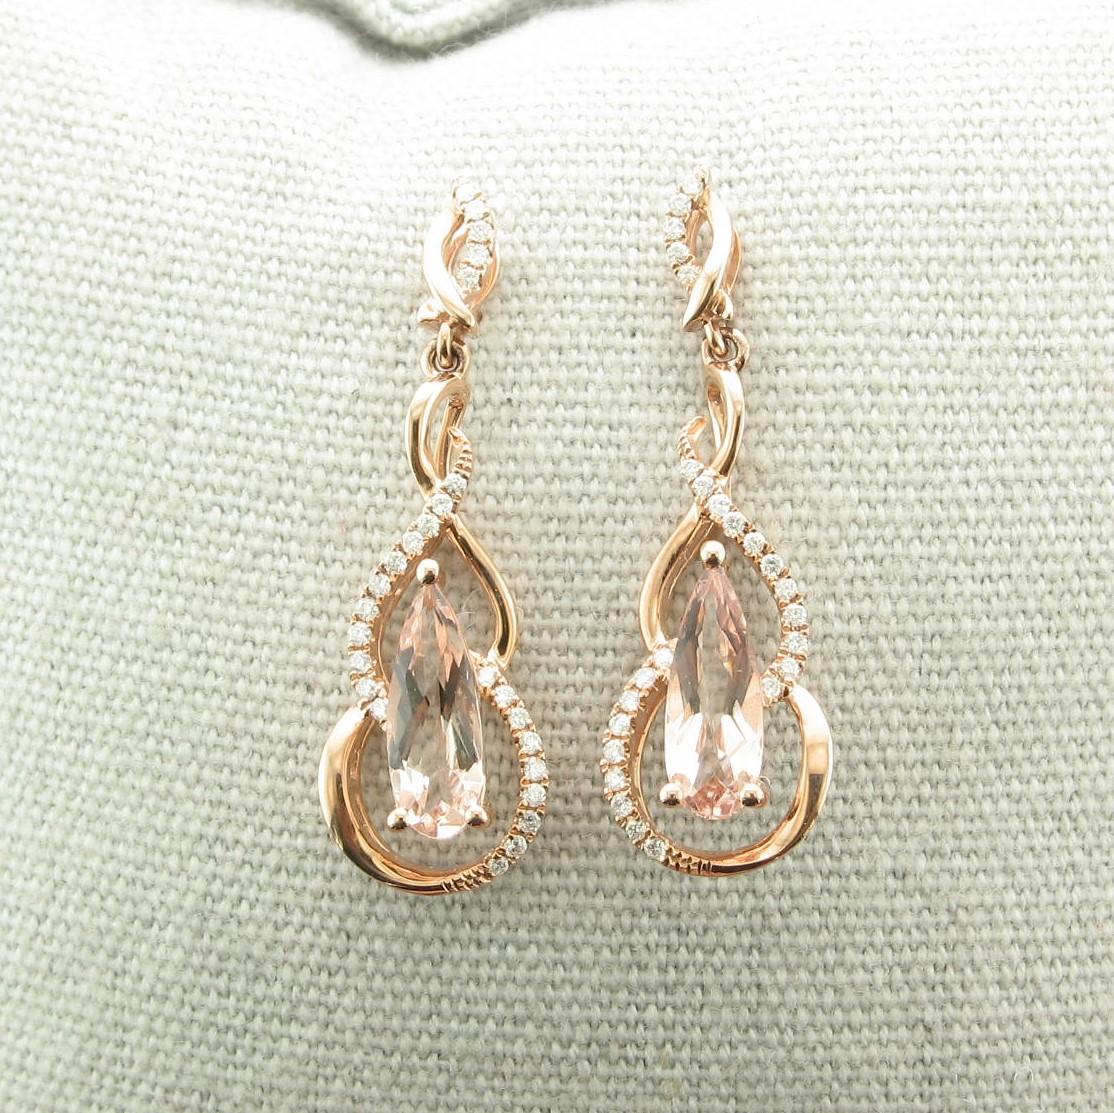 1.83tcw Morganite and Diamond Earrings set in 14k Rose Gold